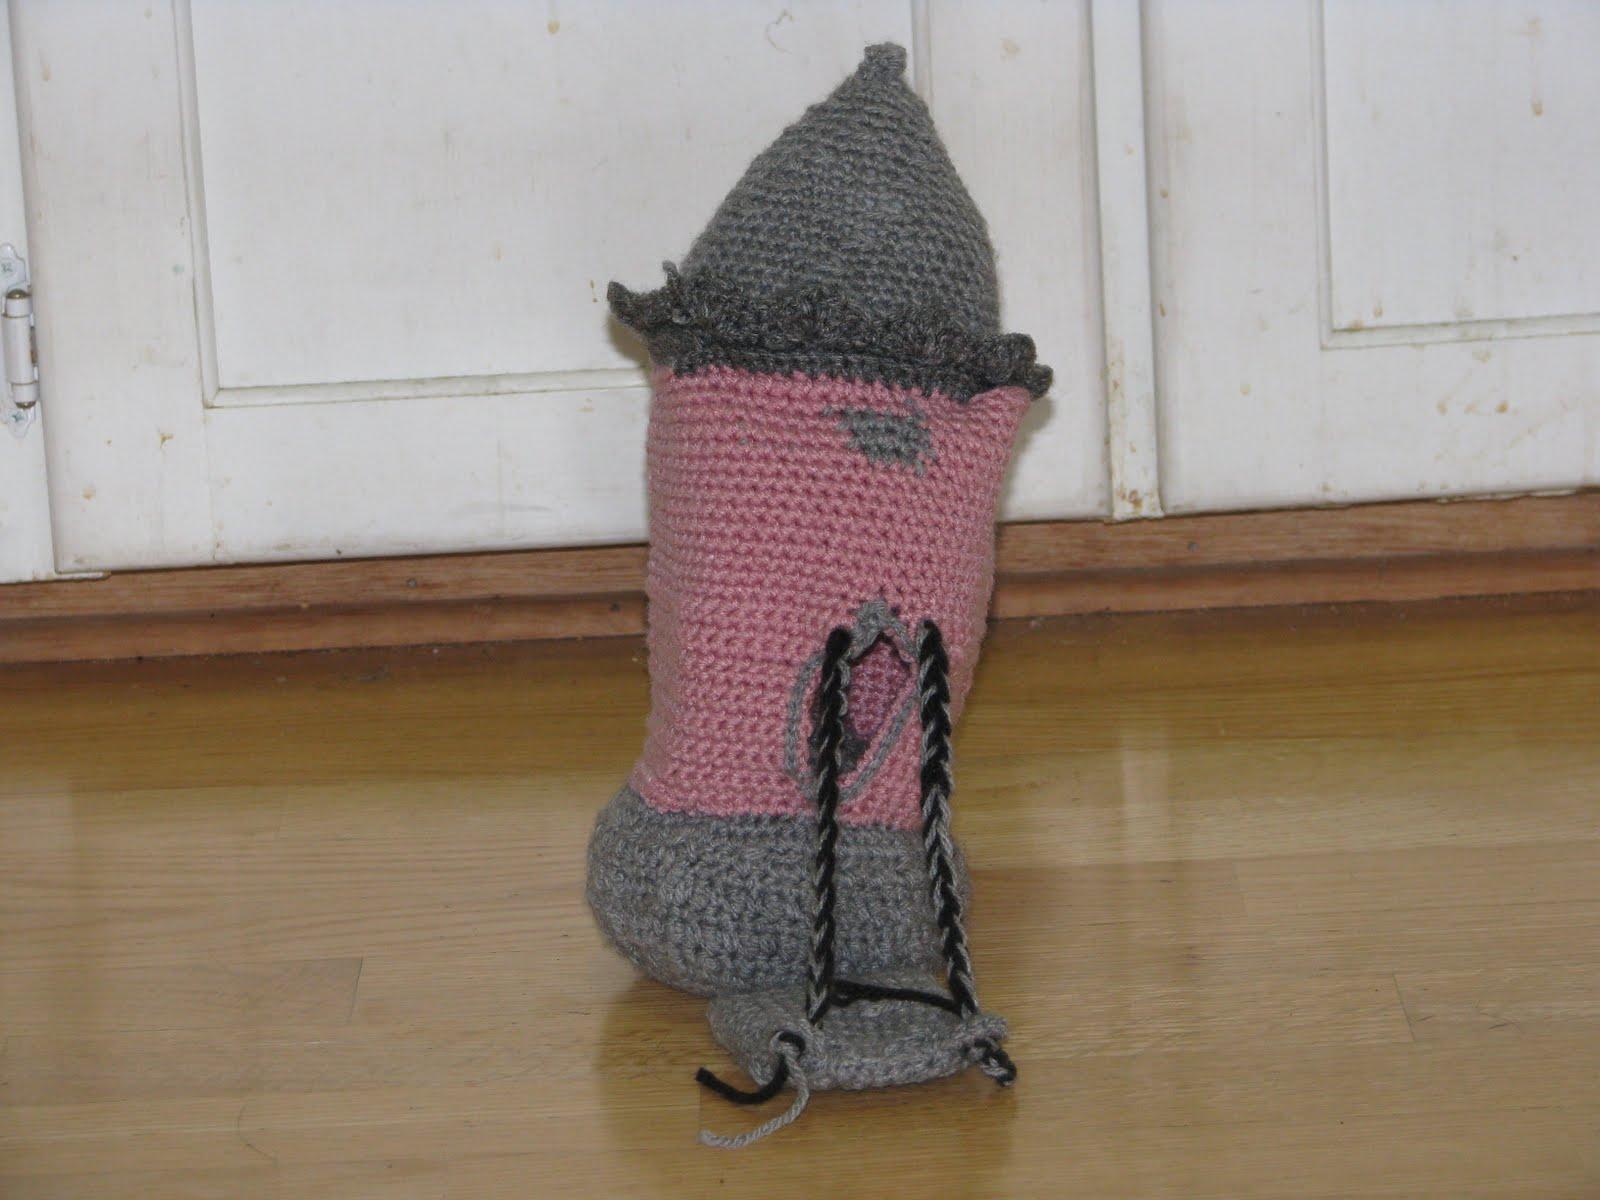 castle in the attic project ideas - Craft Attic Resources Castle Crochet